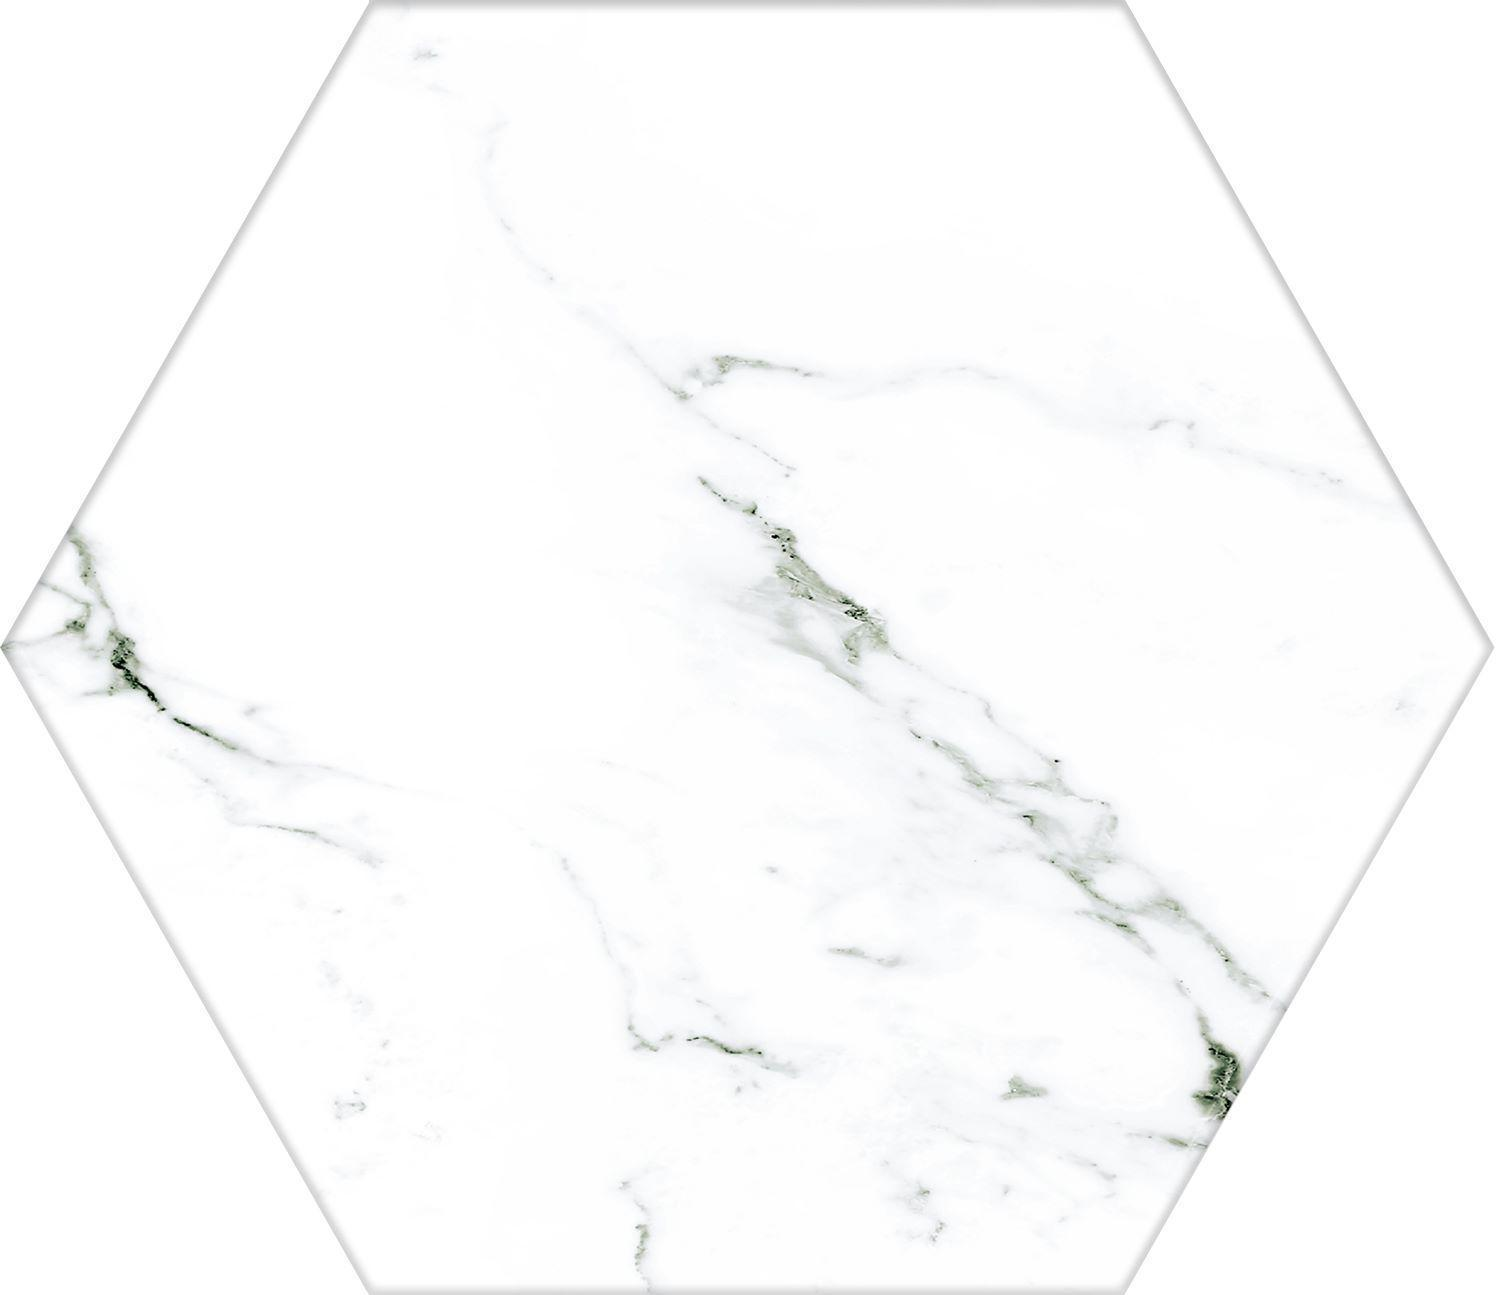 Calacatta 7334 Hex 22x25x1 R9 - Hansas Plaadimaailm